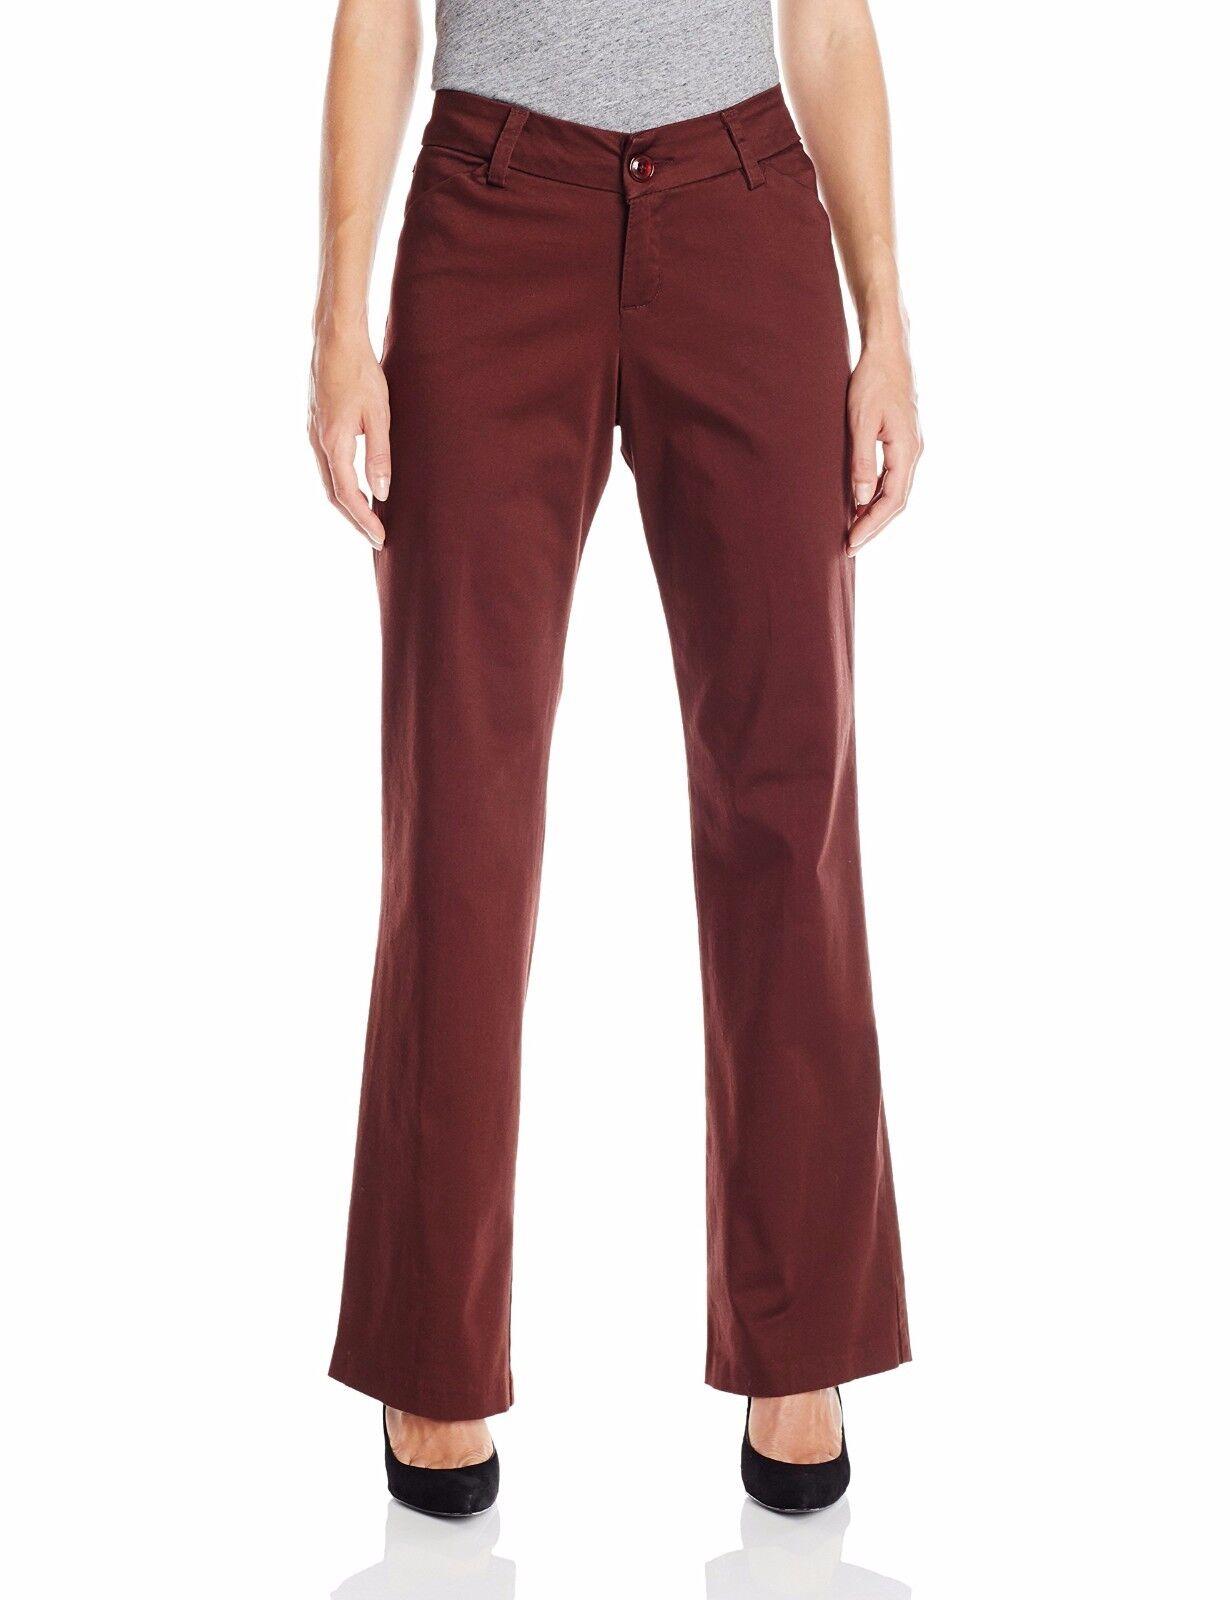 Lee Women's Curvy Fit Modern Series Trouser Pants All Spice Size 16 Medium New